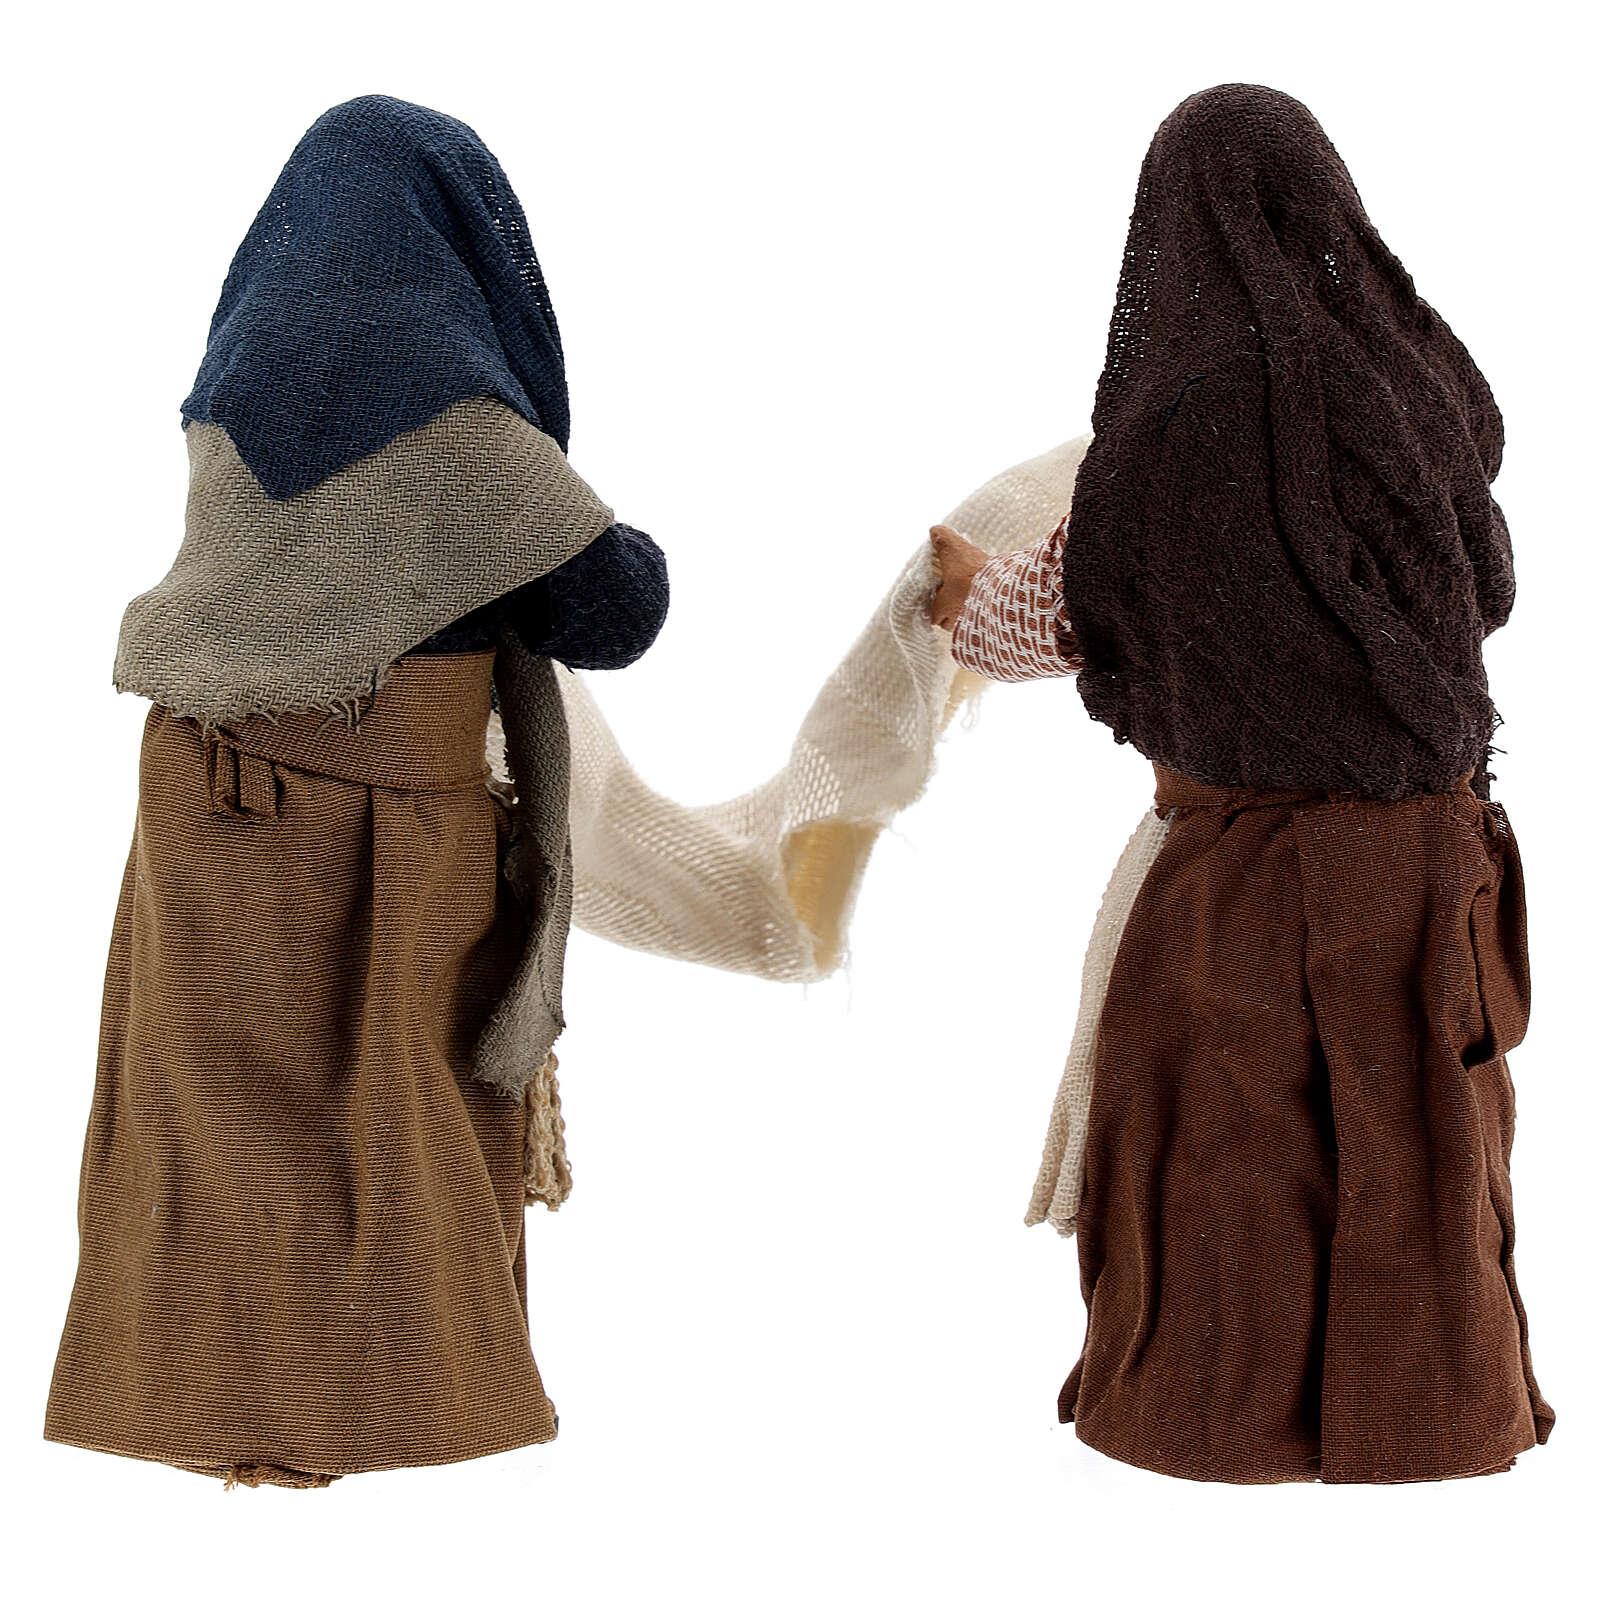 Donne con lenzuolo presepe napoletano 13 cm 4